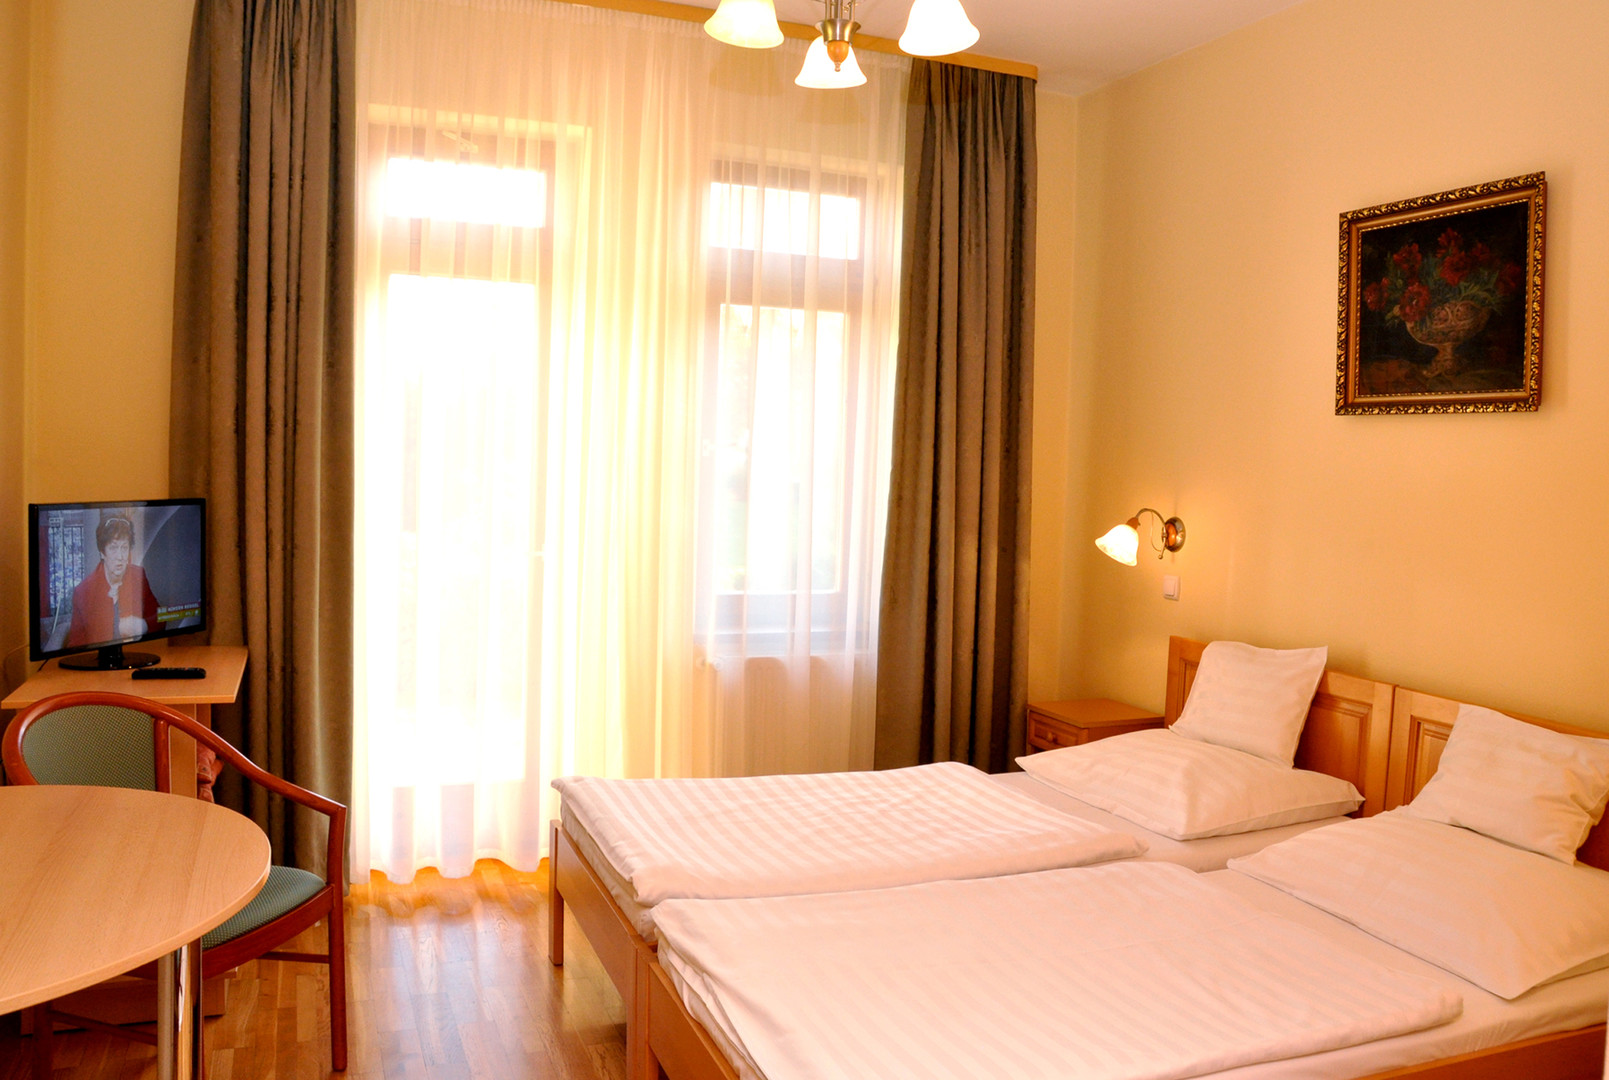 Hotel Ametiszt #5